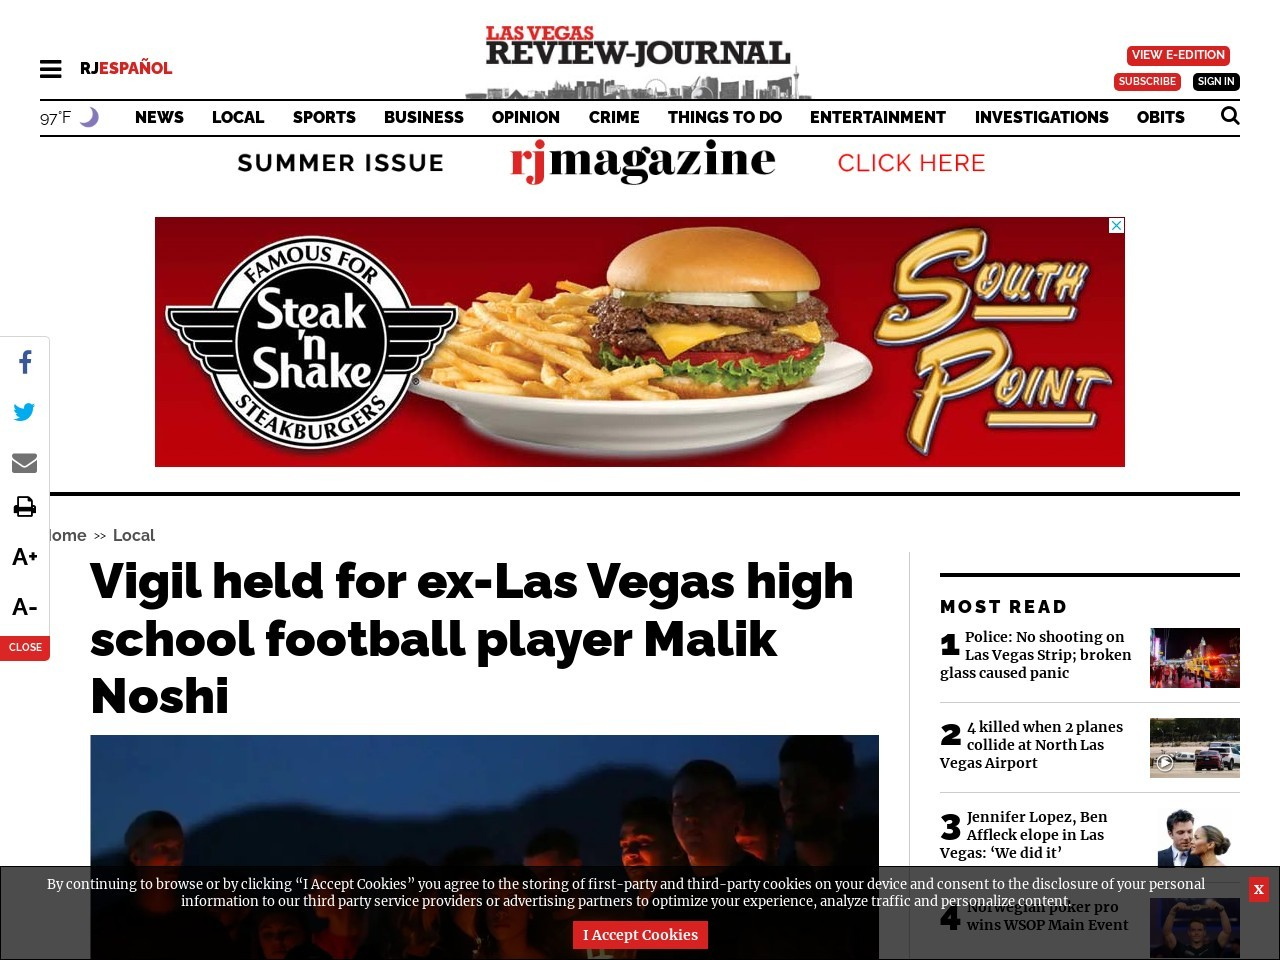 Vigil held for ex-Las Vegas high school football player Malik Noshi